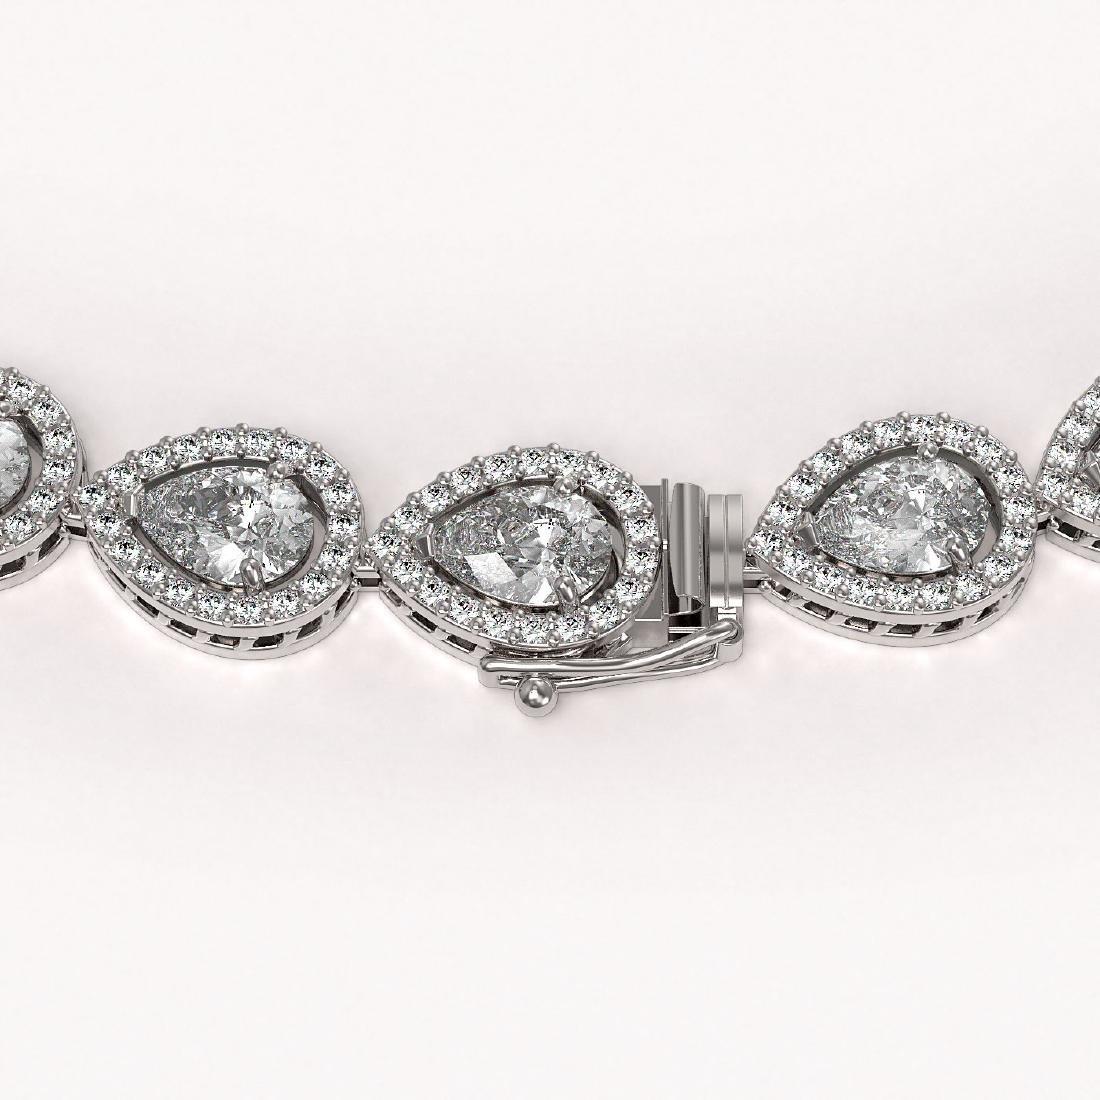 33.08 CTW Pear Diamond Designer Necklace 18K White Gold - 3